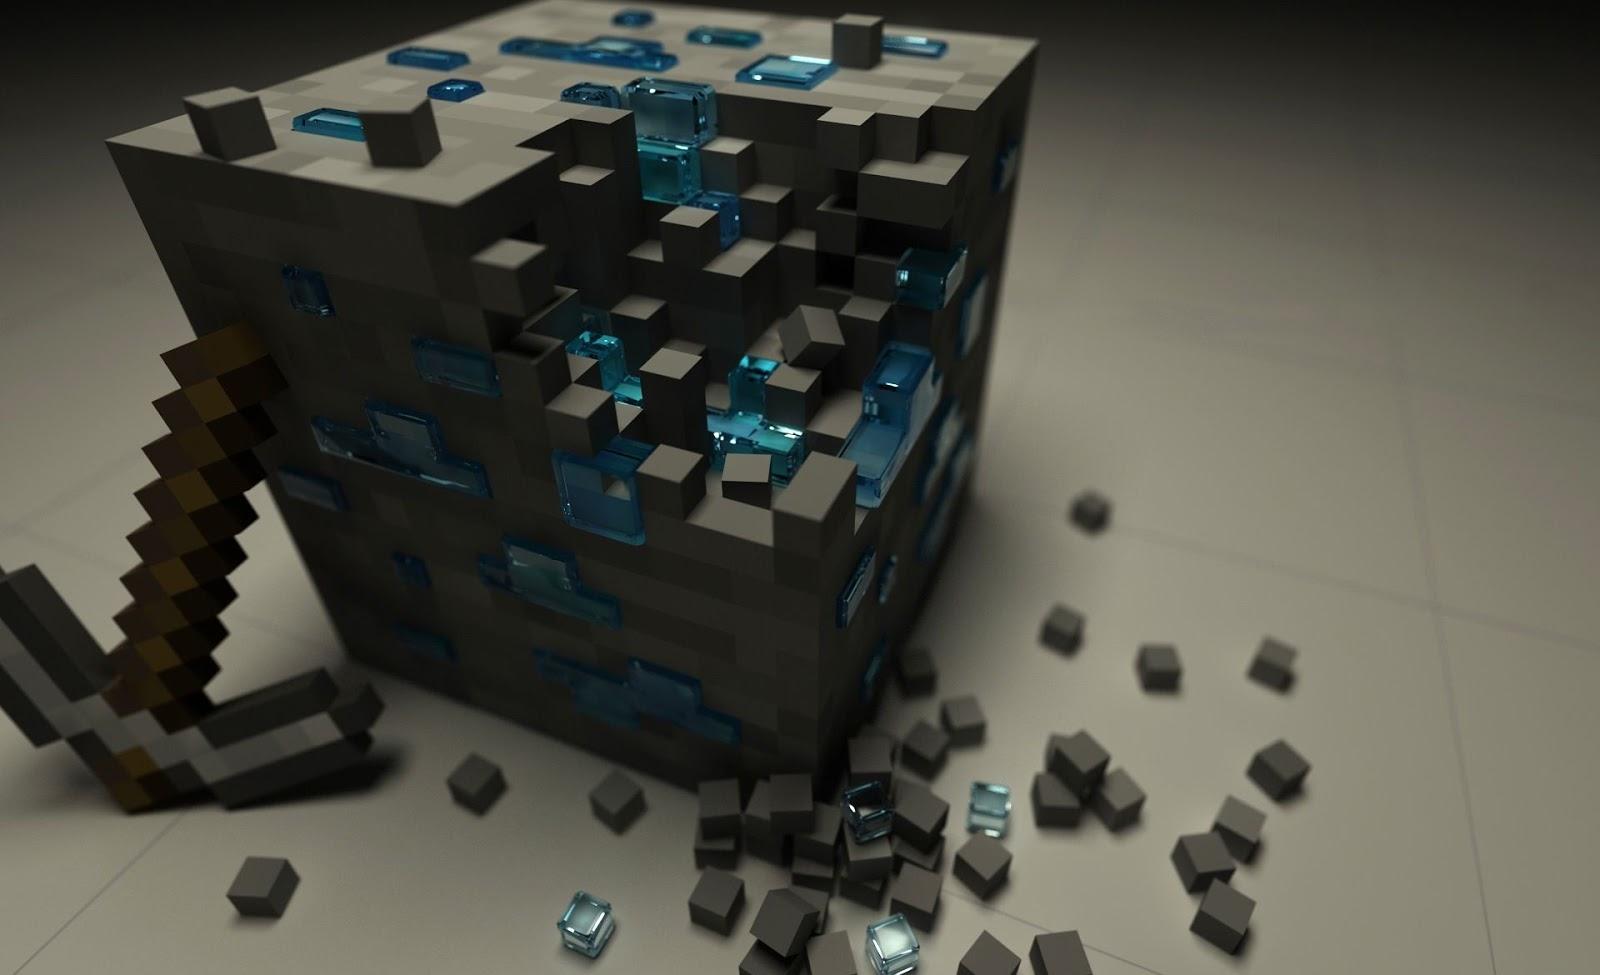 http://4.bp.blogspot.com/-HqDNpKlcLMc/TZpDVinJ2rI/AAAAAAAAHlM/1p5wQZ1n7IM/s1600/Minecraft%20background%20cube.jpg